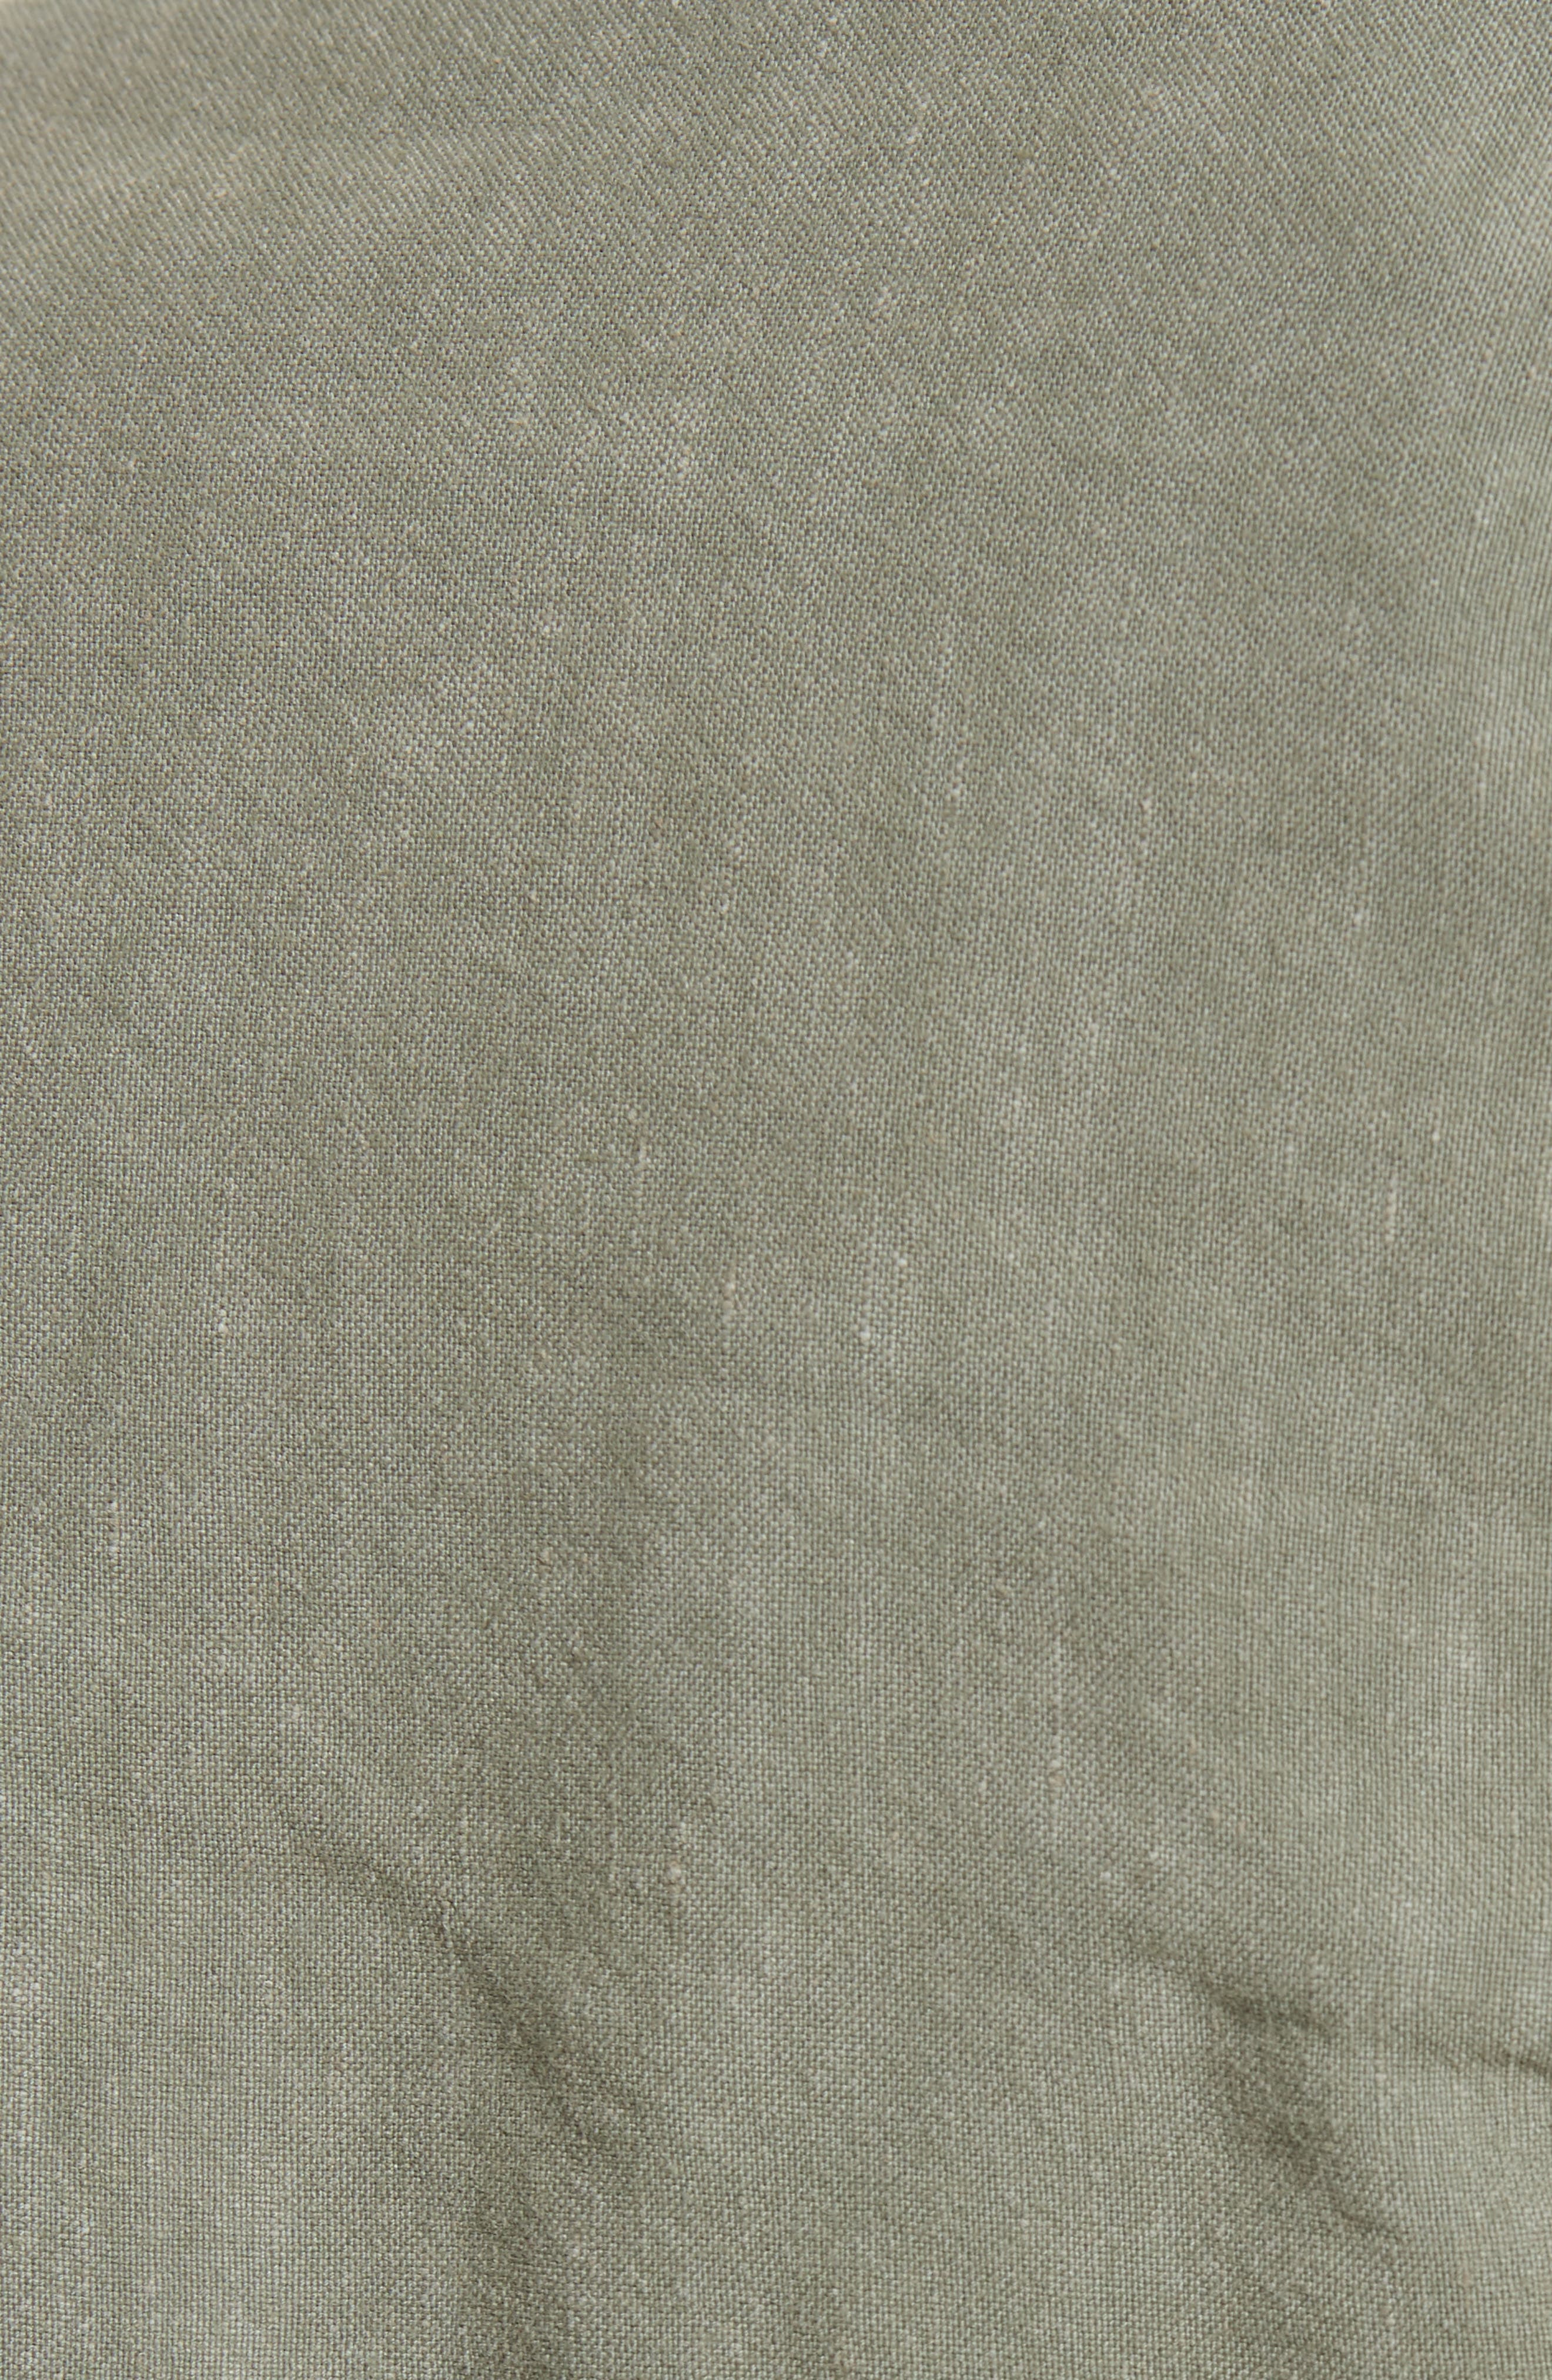 Ruched Linen Bomber Jacket,                             Alternate thumbnail 6, color,                             300